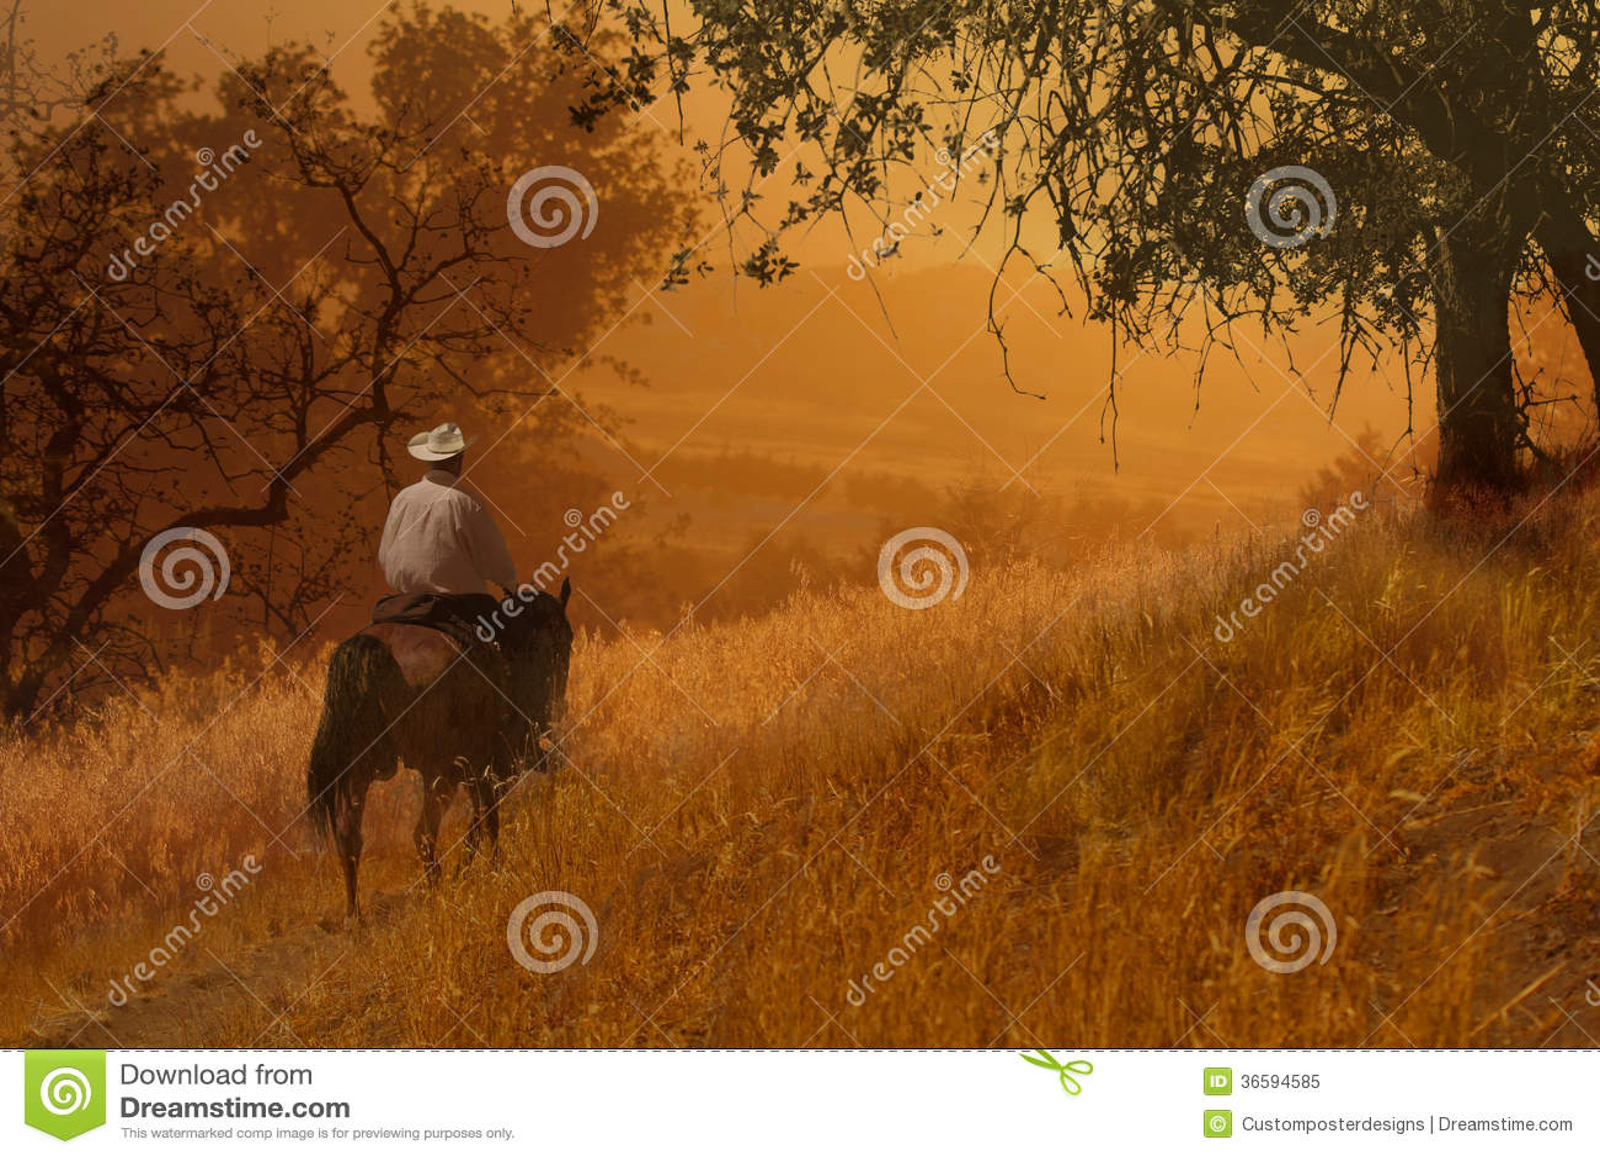 A cowboy riding a horse VIII.